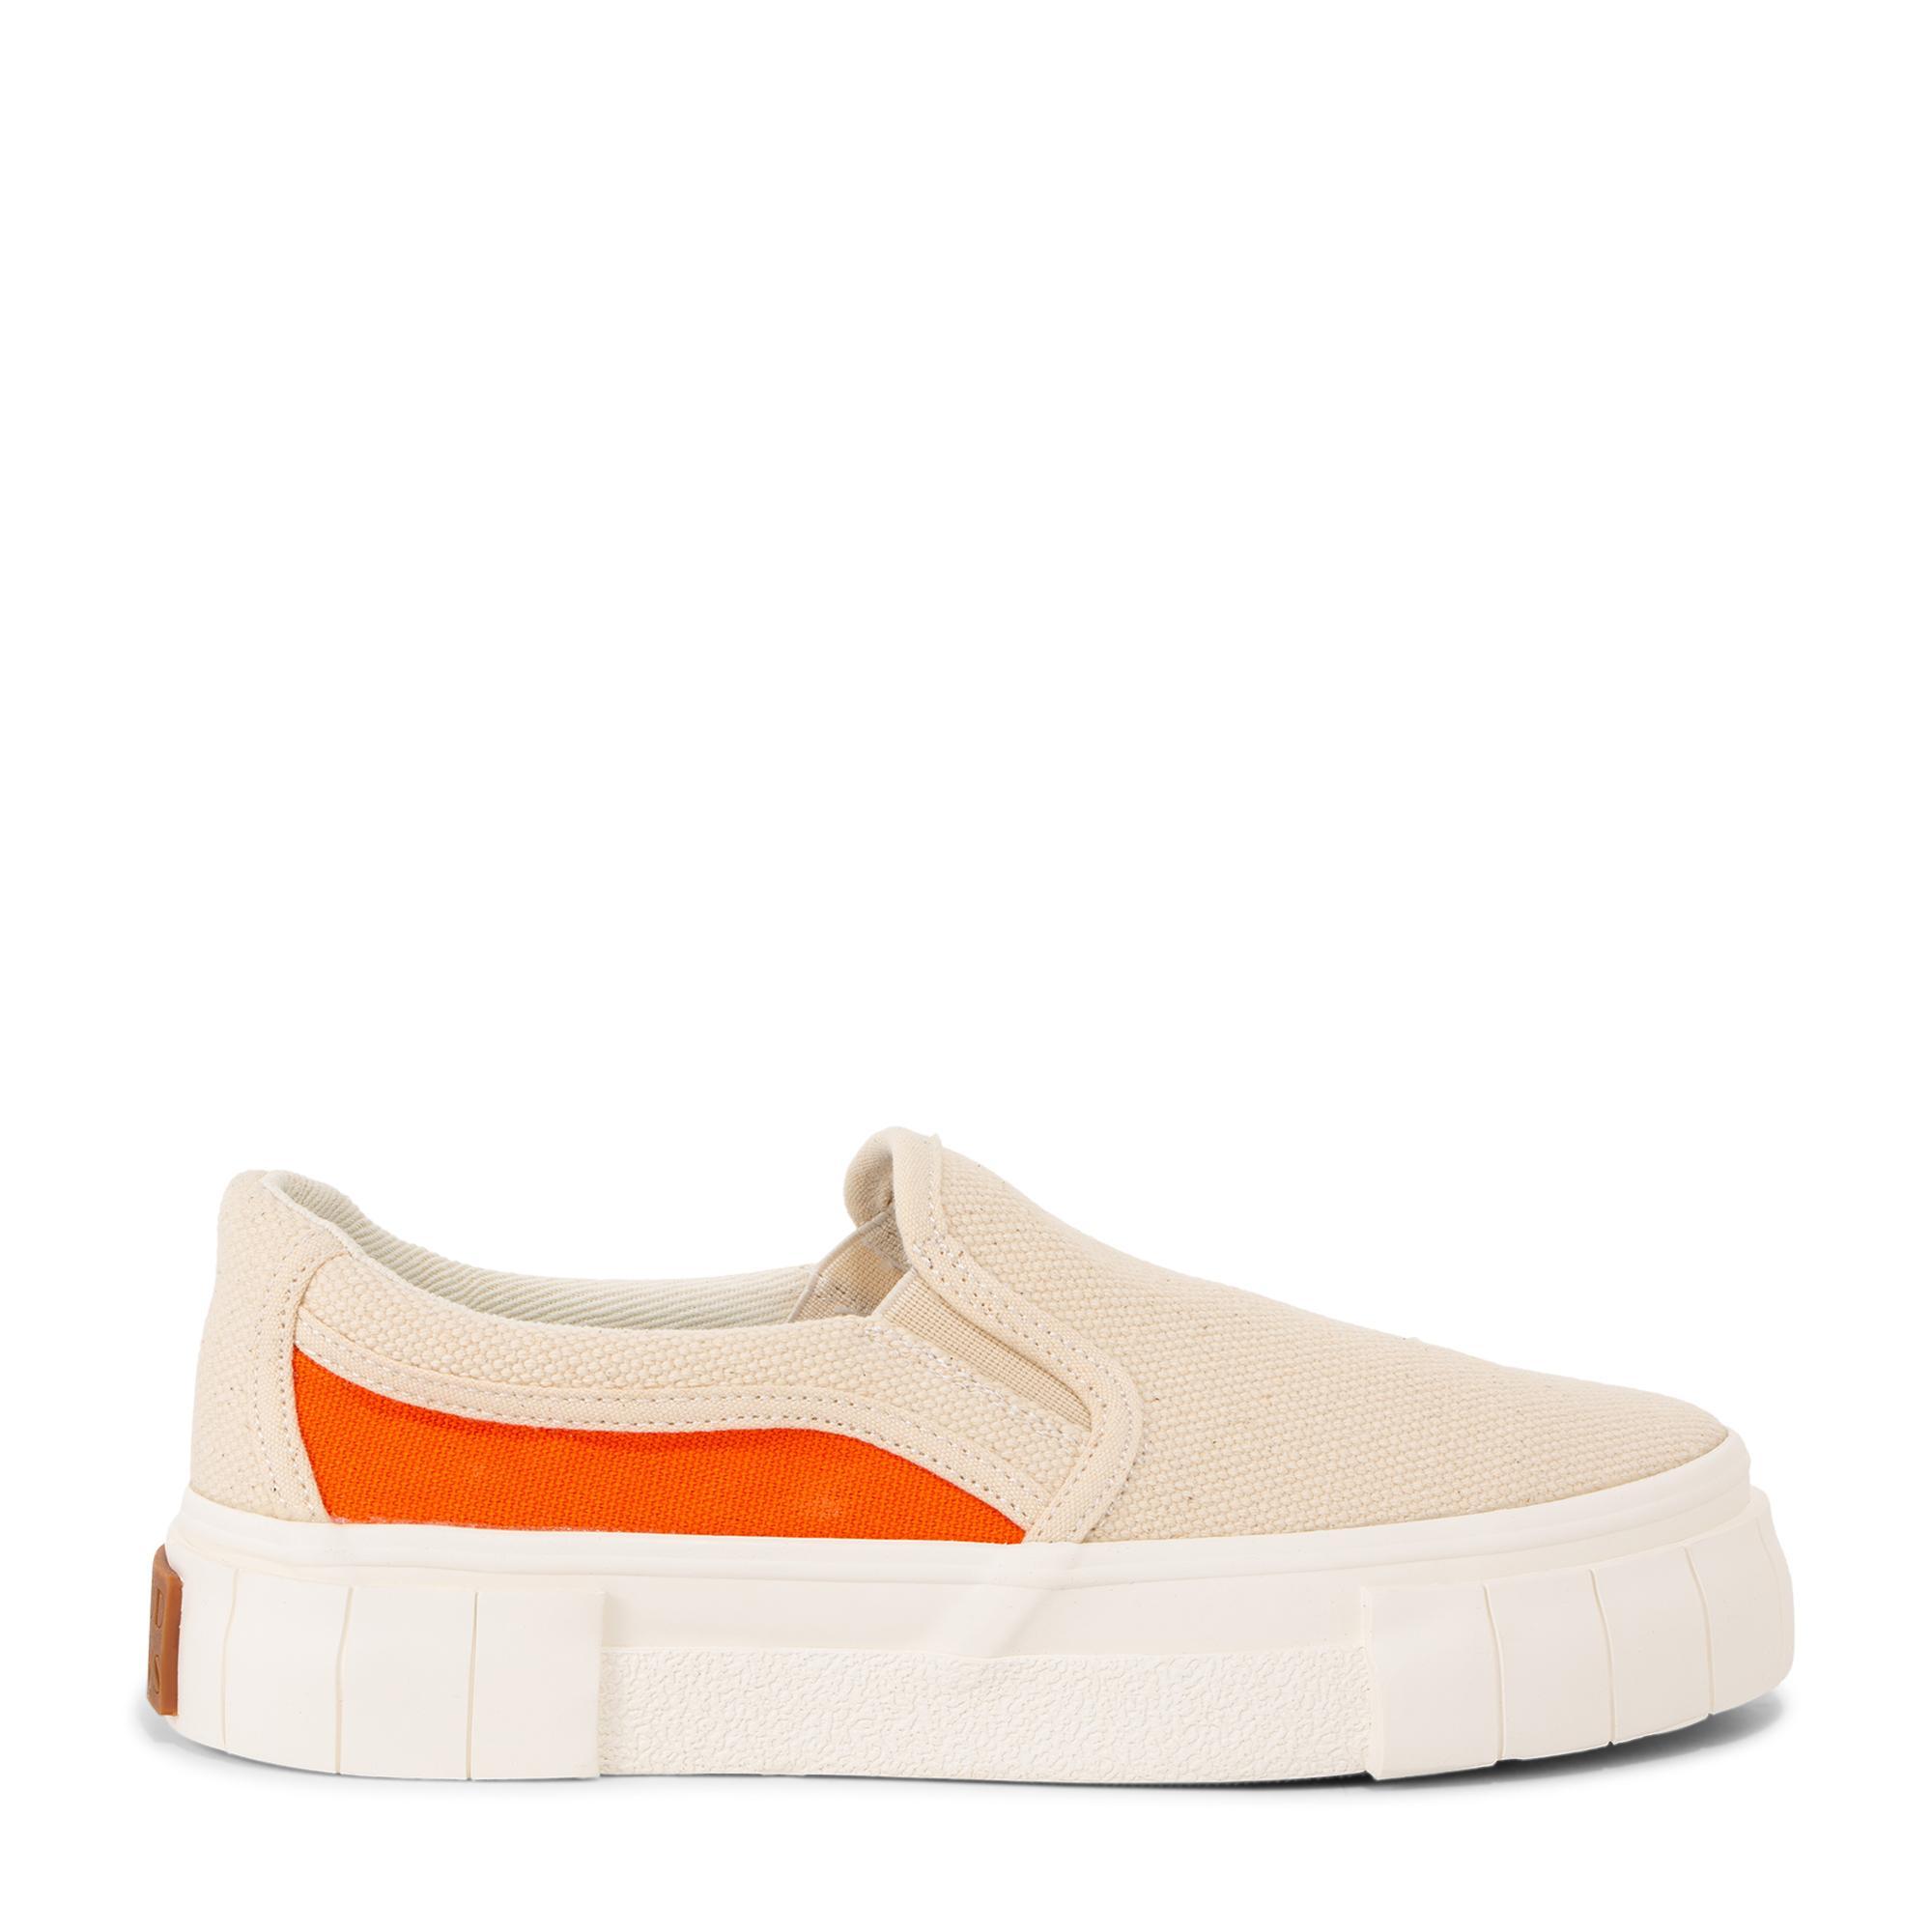 Yess slip-on sneakers